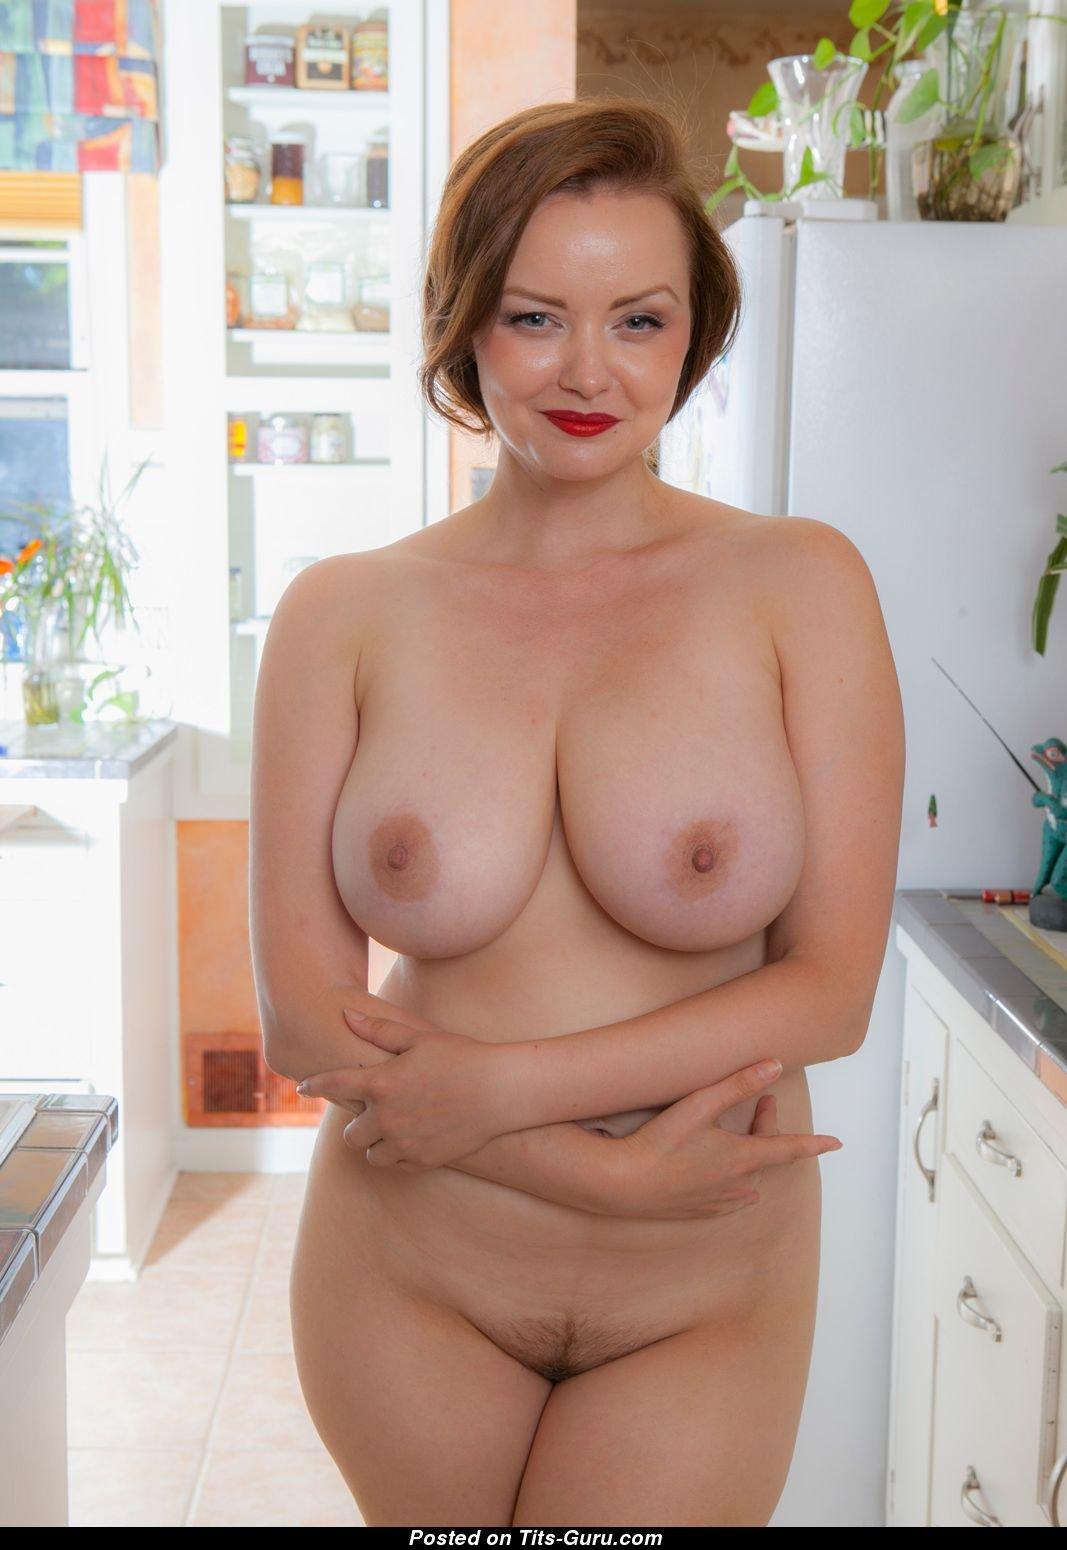 Bombshell mcgee sex video